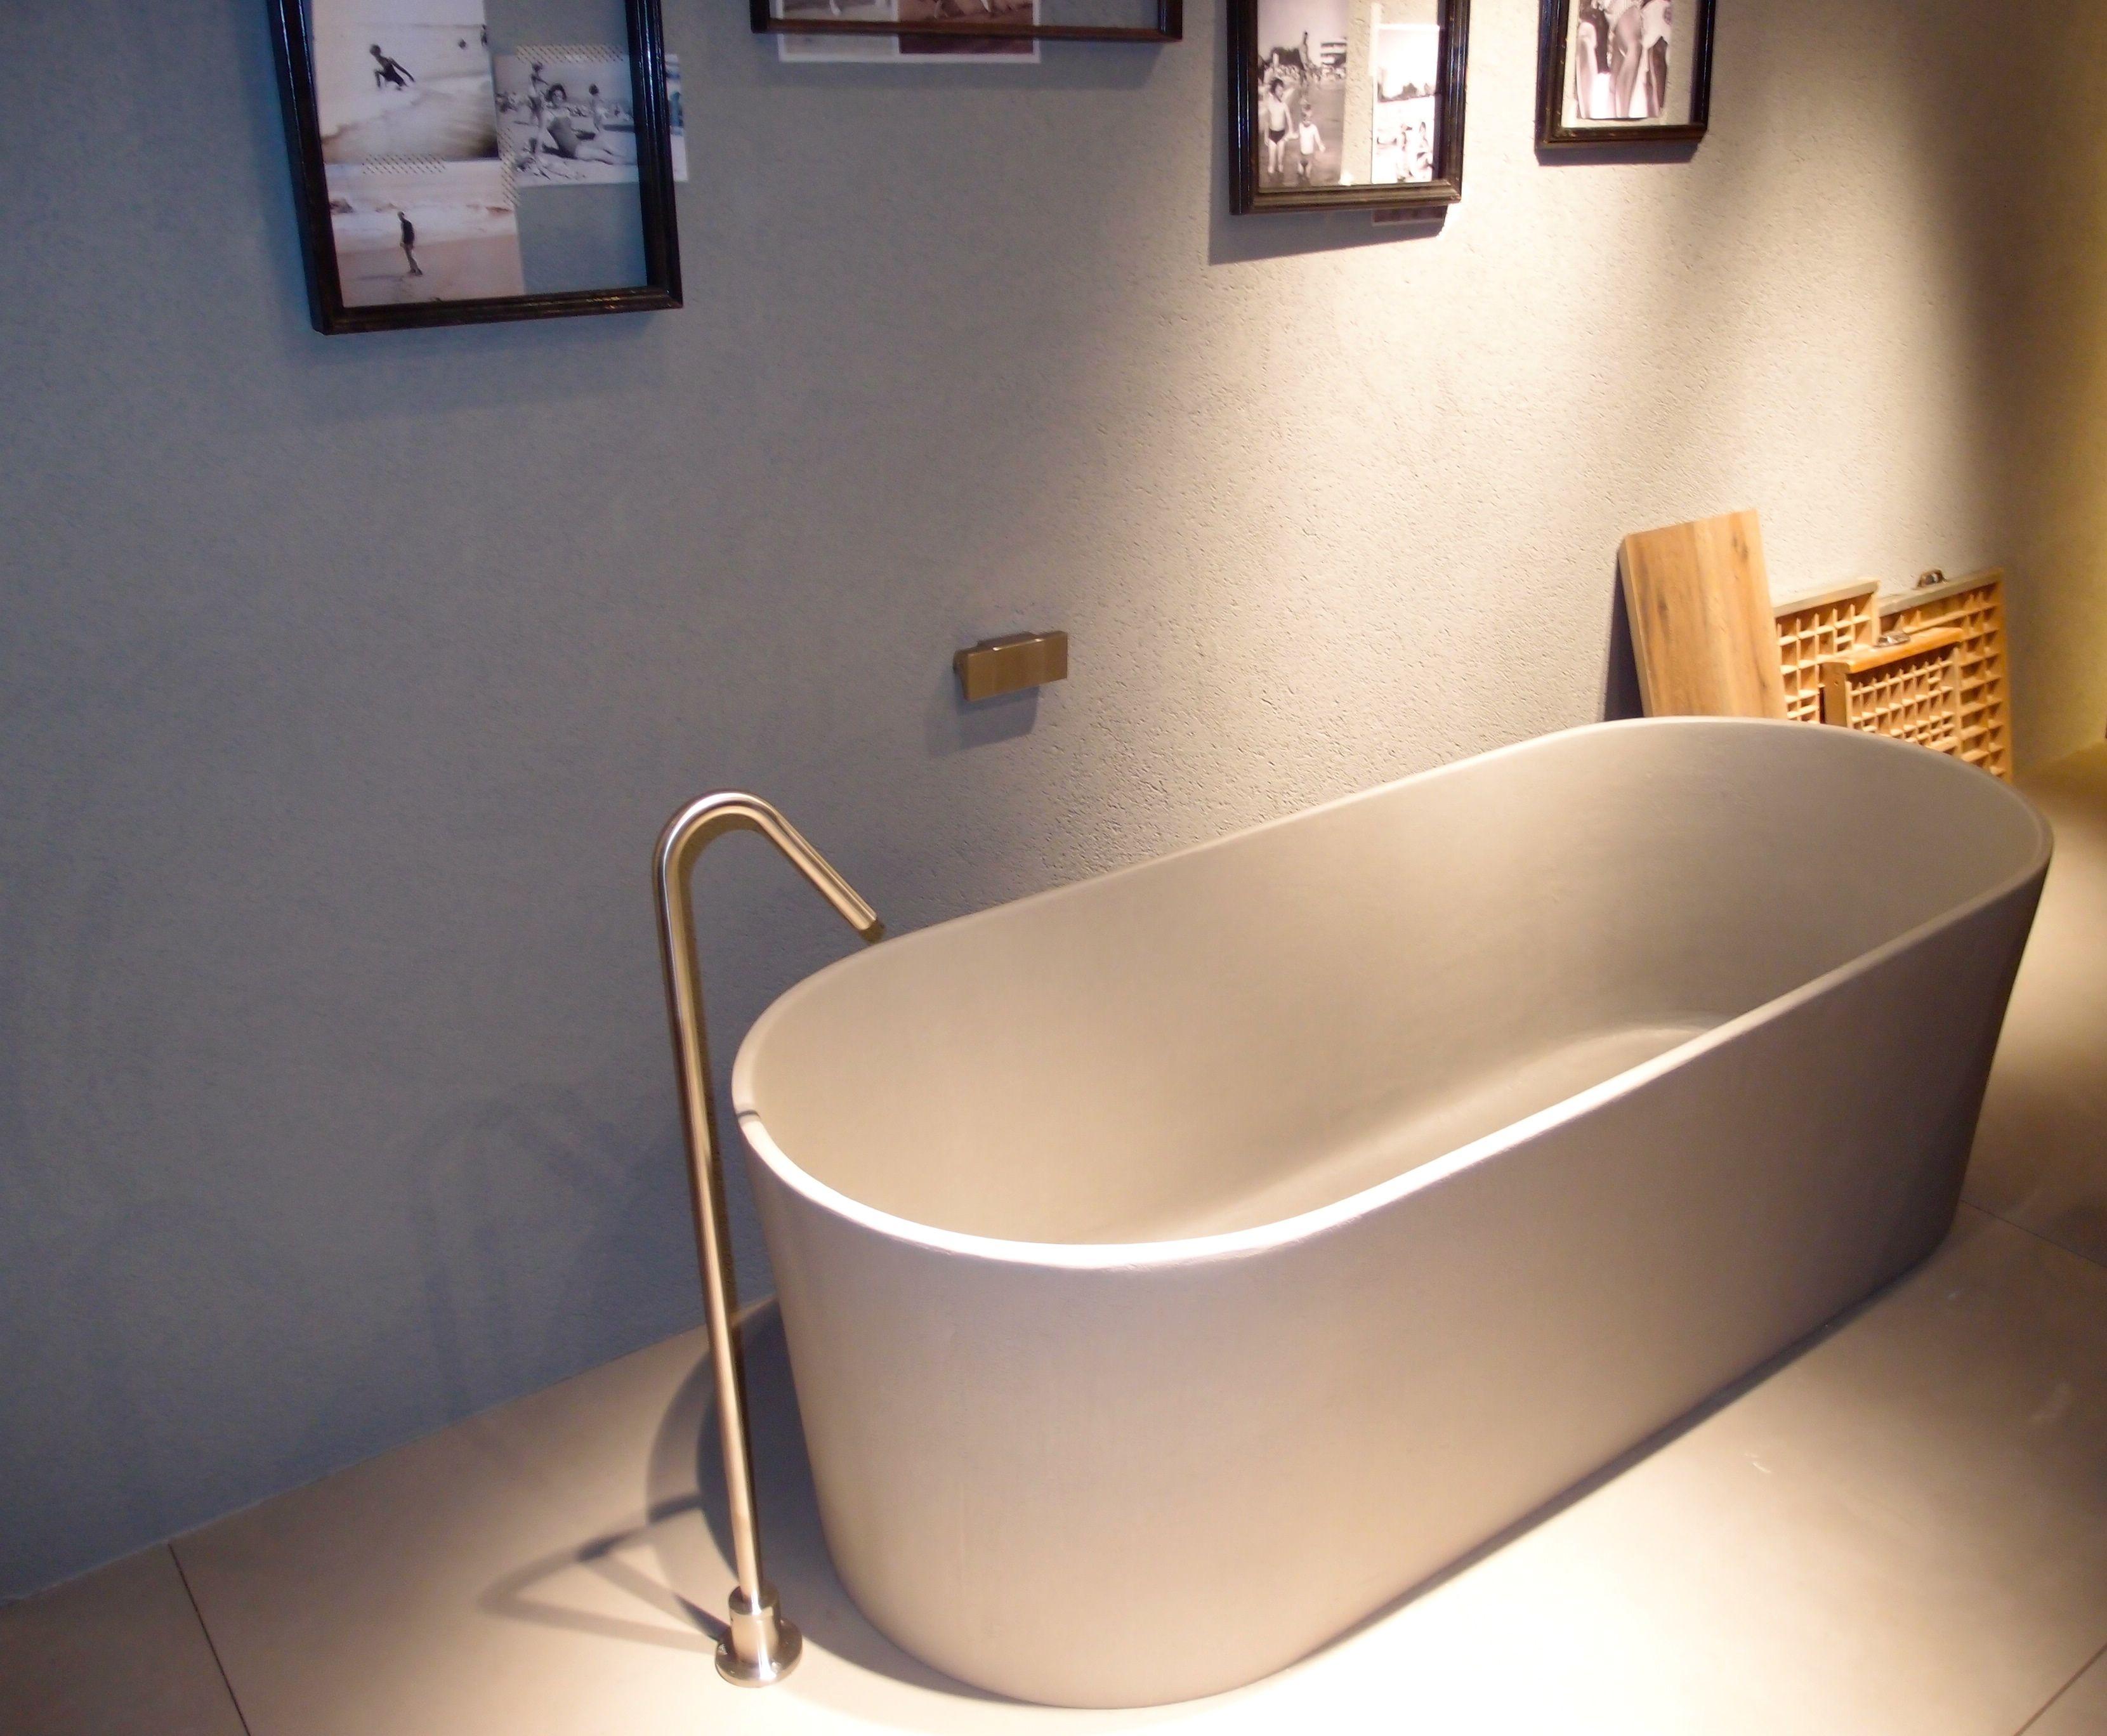 arredo bagno vasca relax design essenziale | arredo bagno | pinterest - Arredo Bagno Vasca